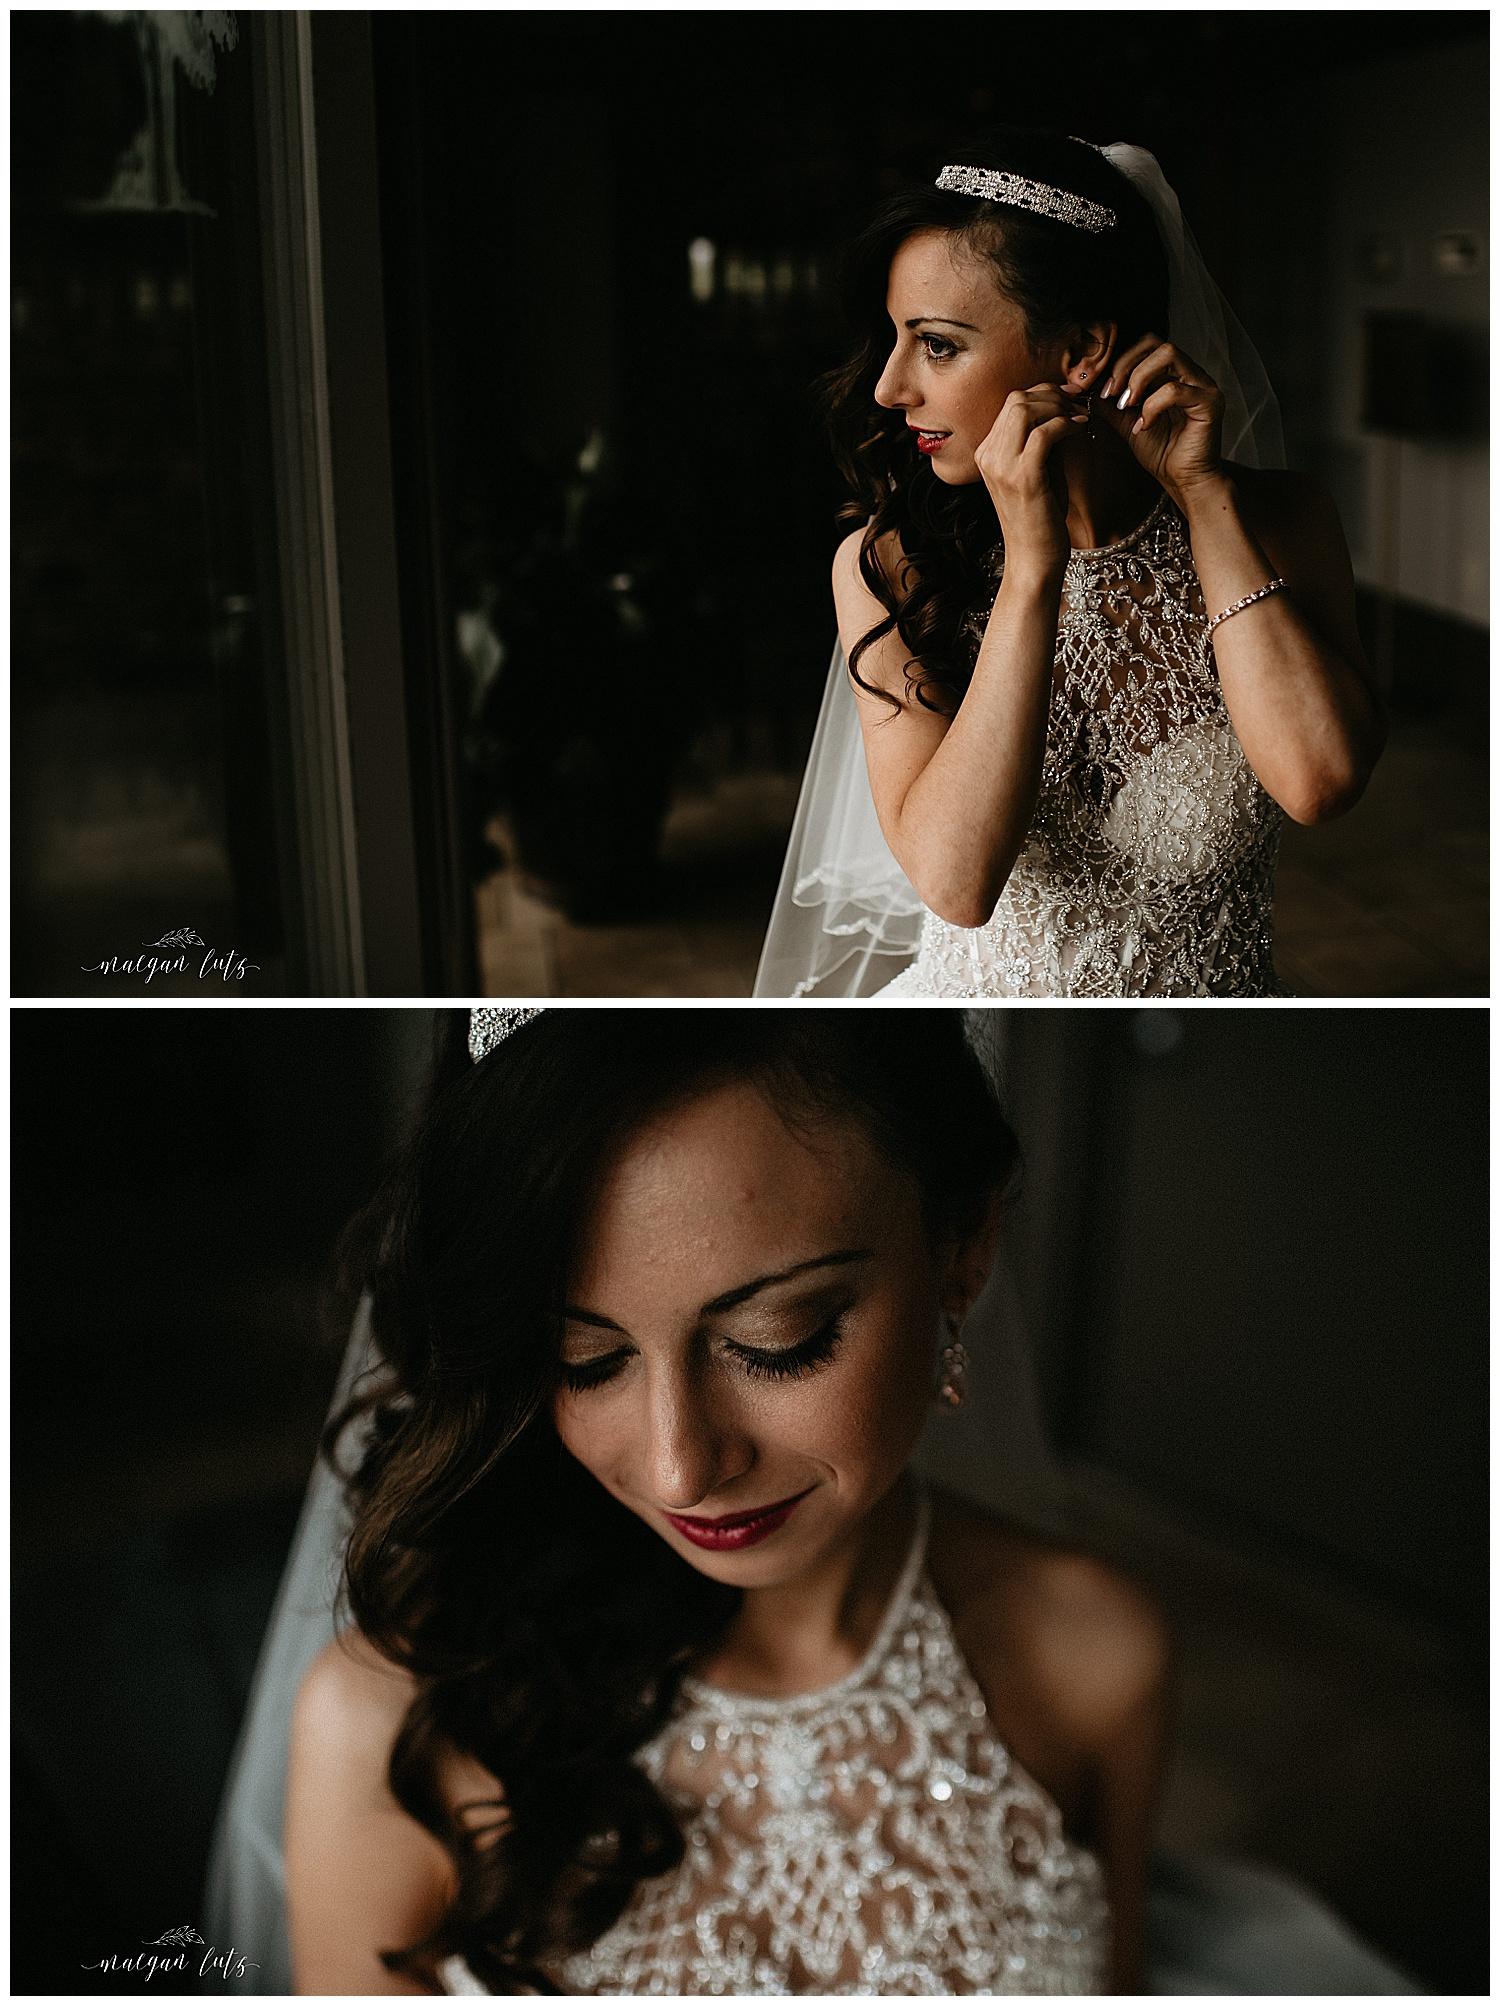 NEPA-Lehigh-Valley-Wedding-Photographer-at-Glen-Oak-Country-Club-Clarks-Summit-PA_0010.jpg